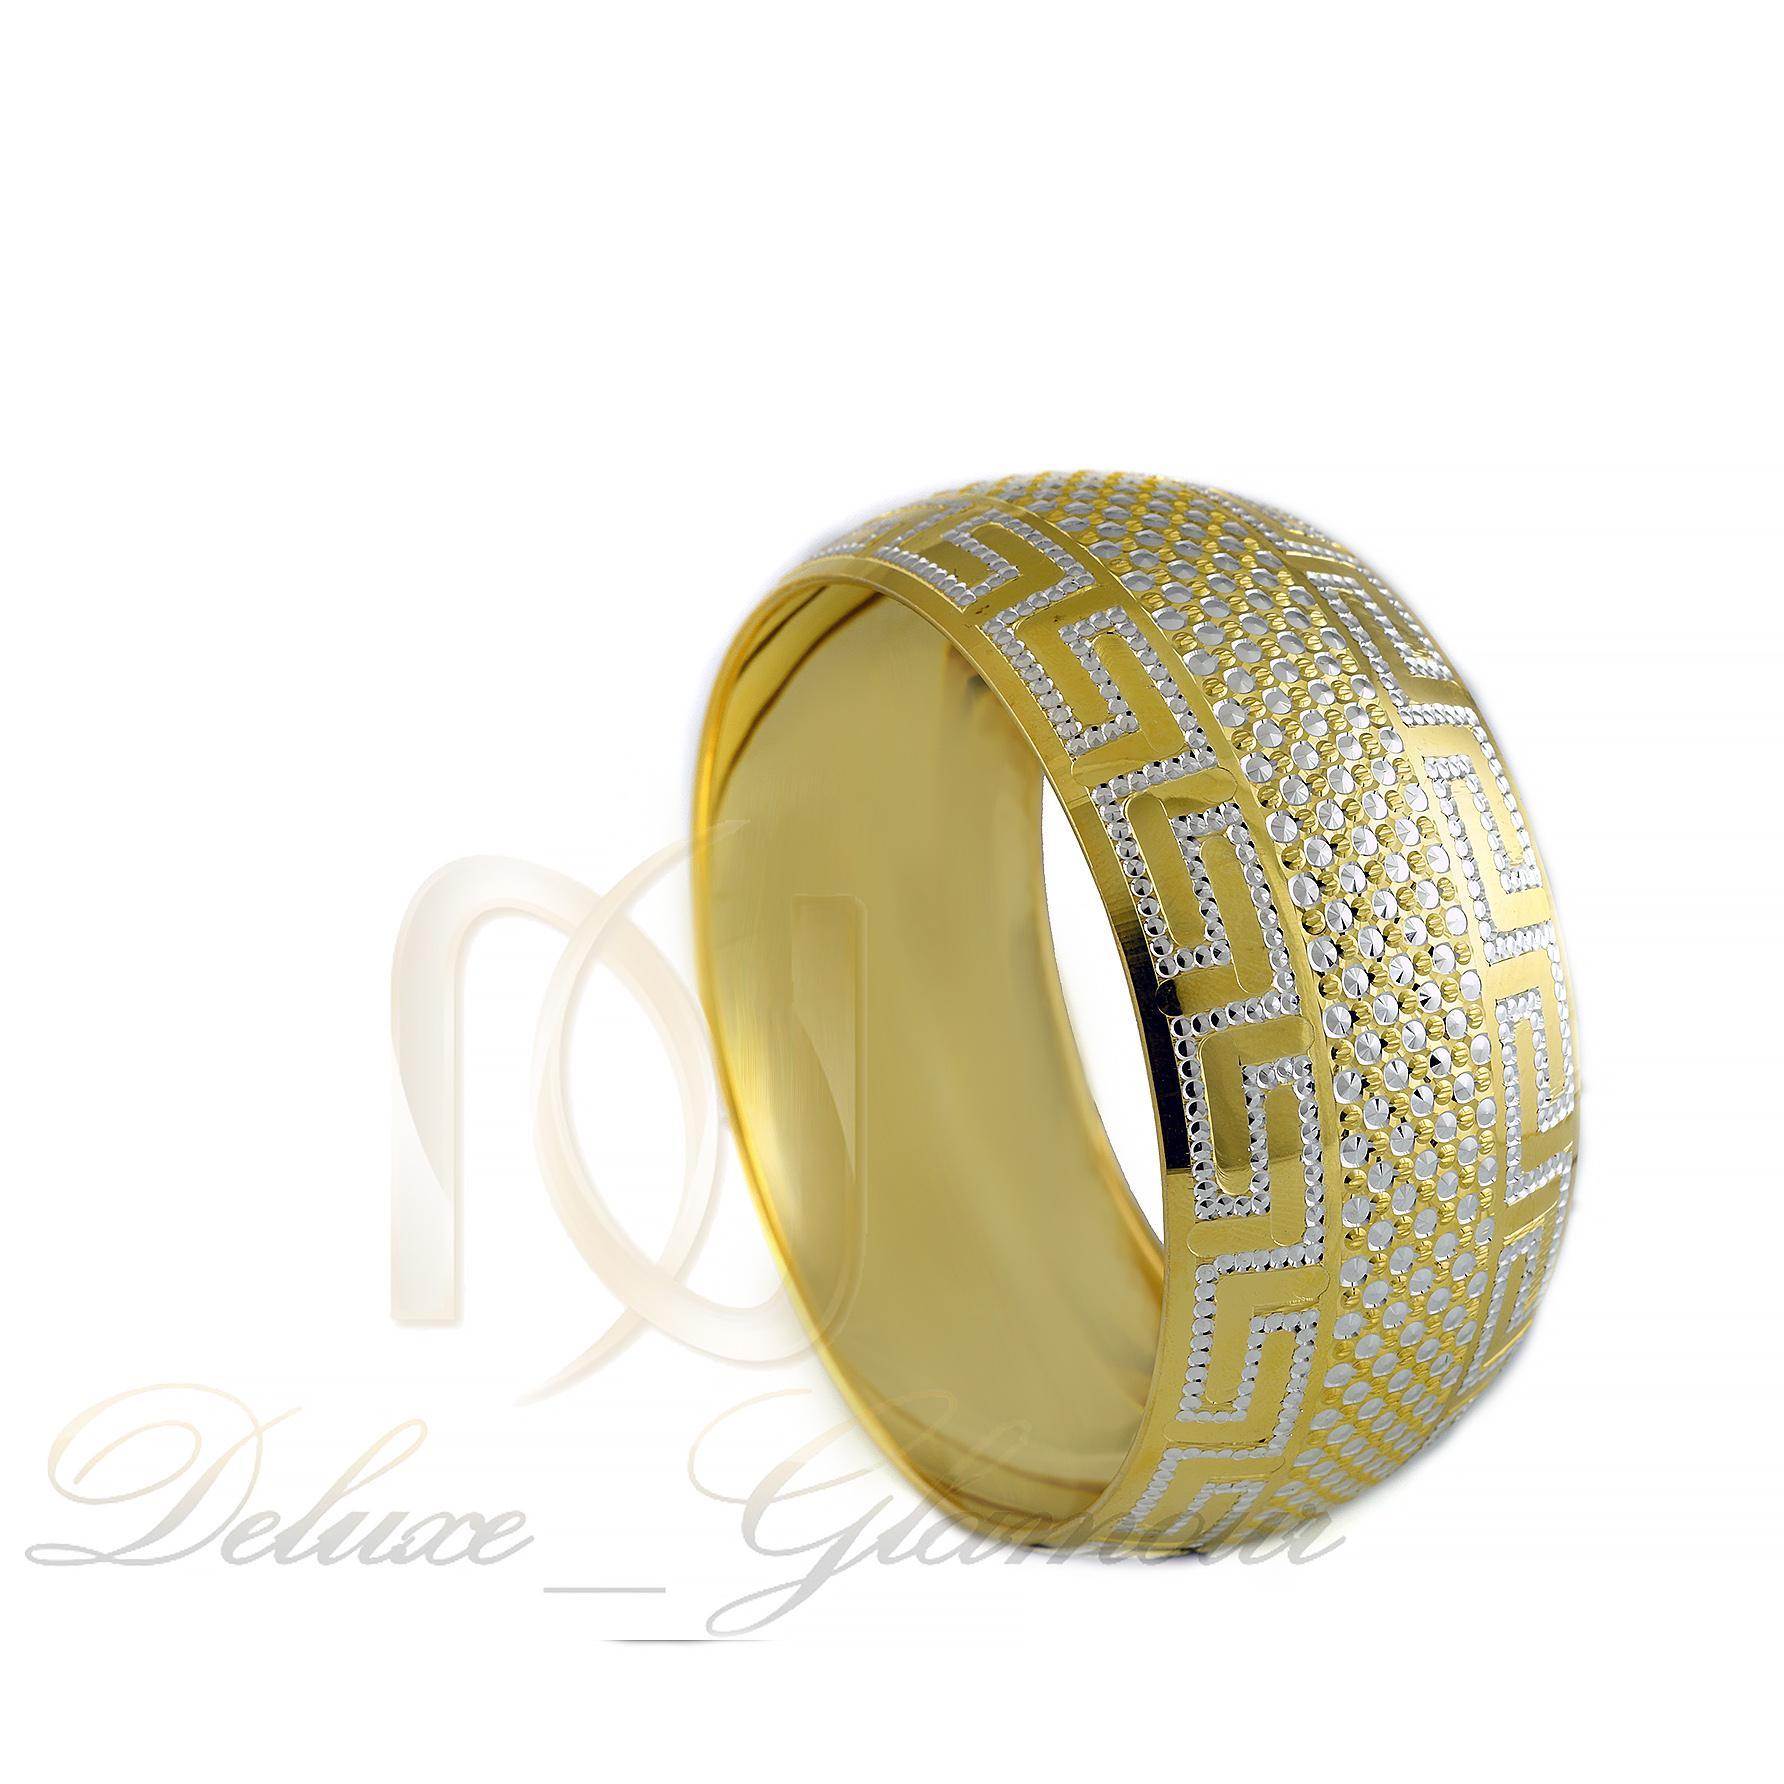 النگو تك پوش نقره طرح طلا al-n114 از نماي روبرو